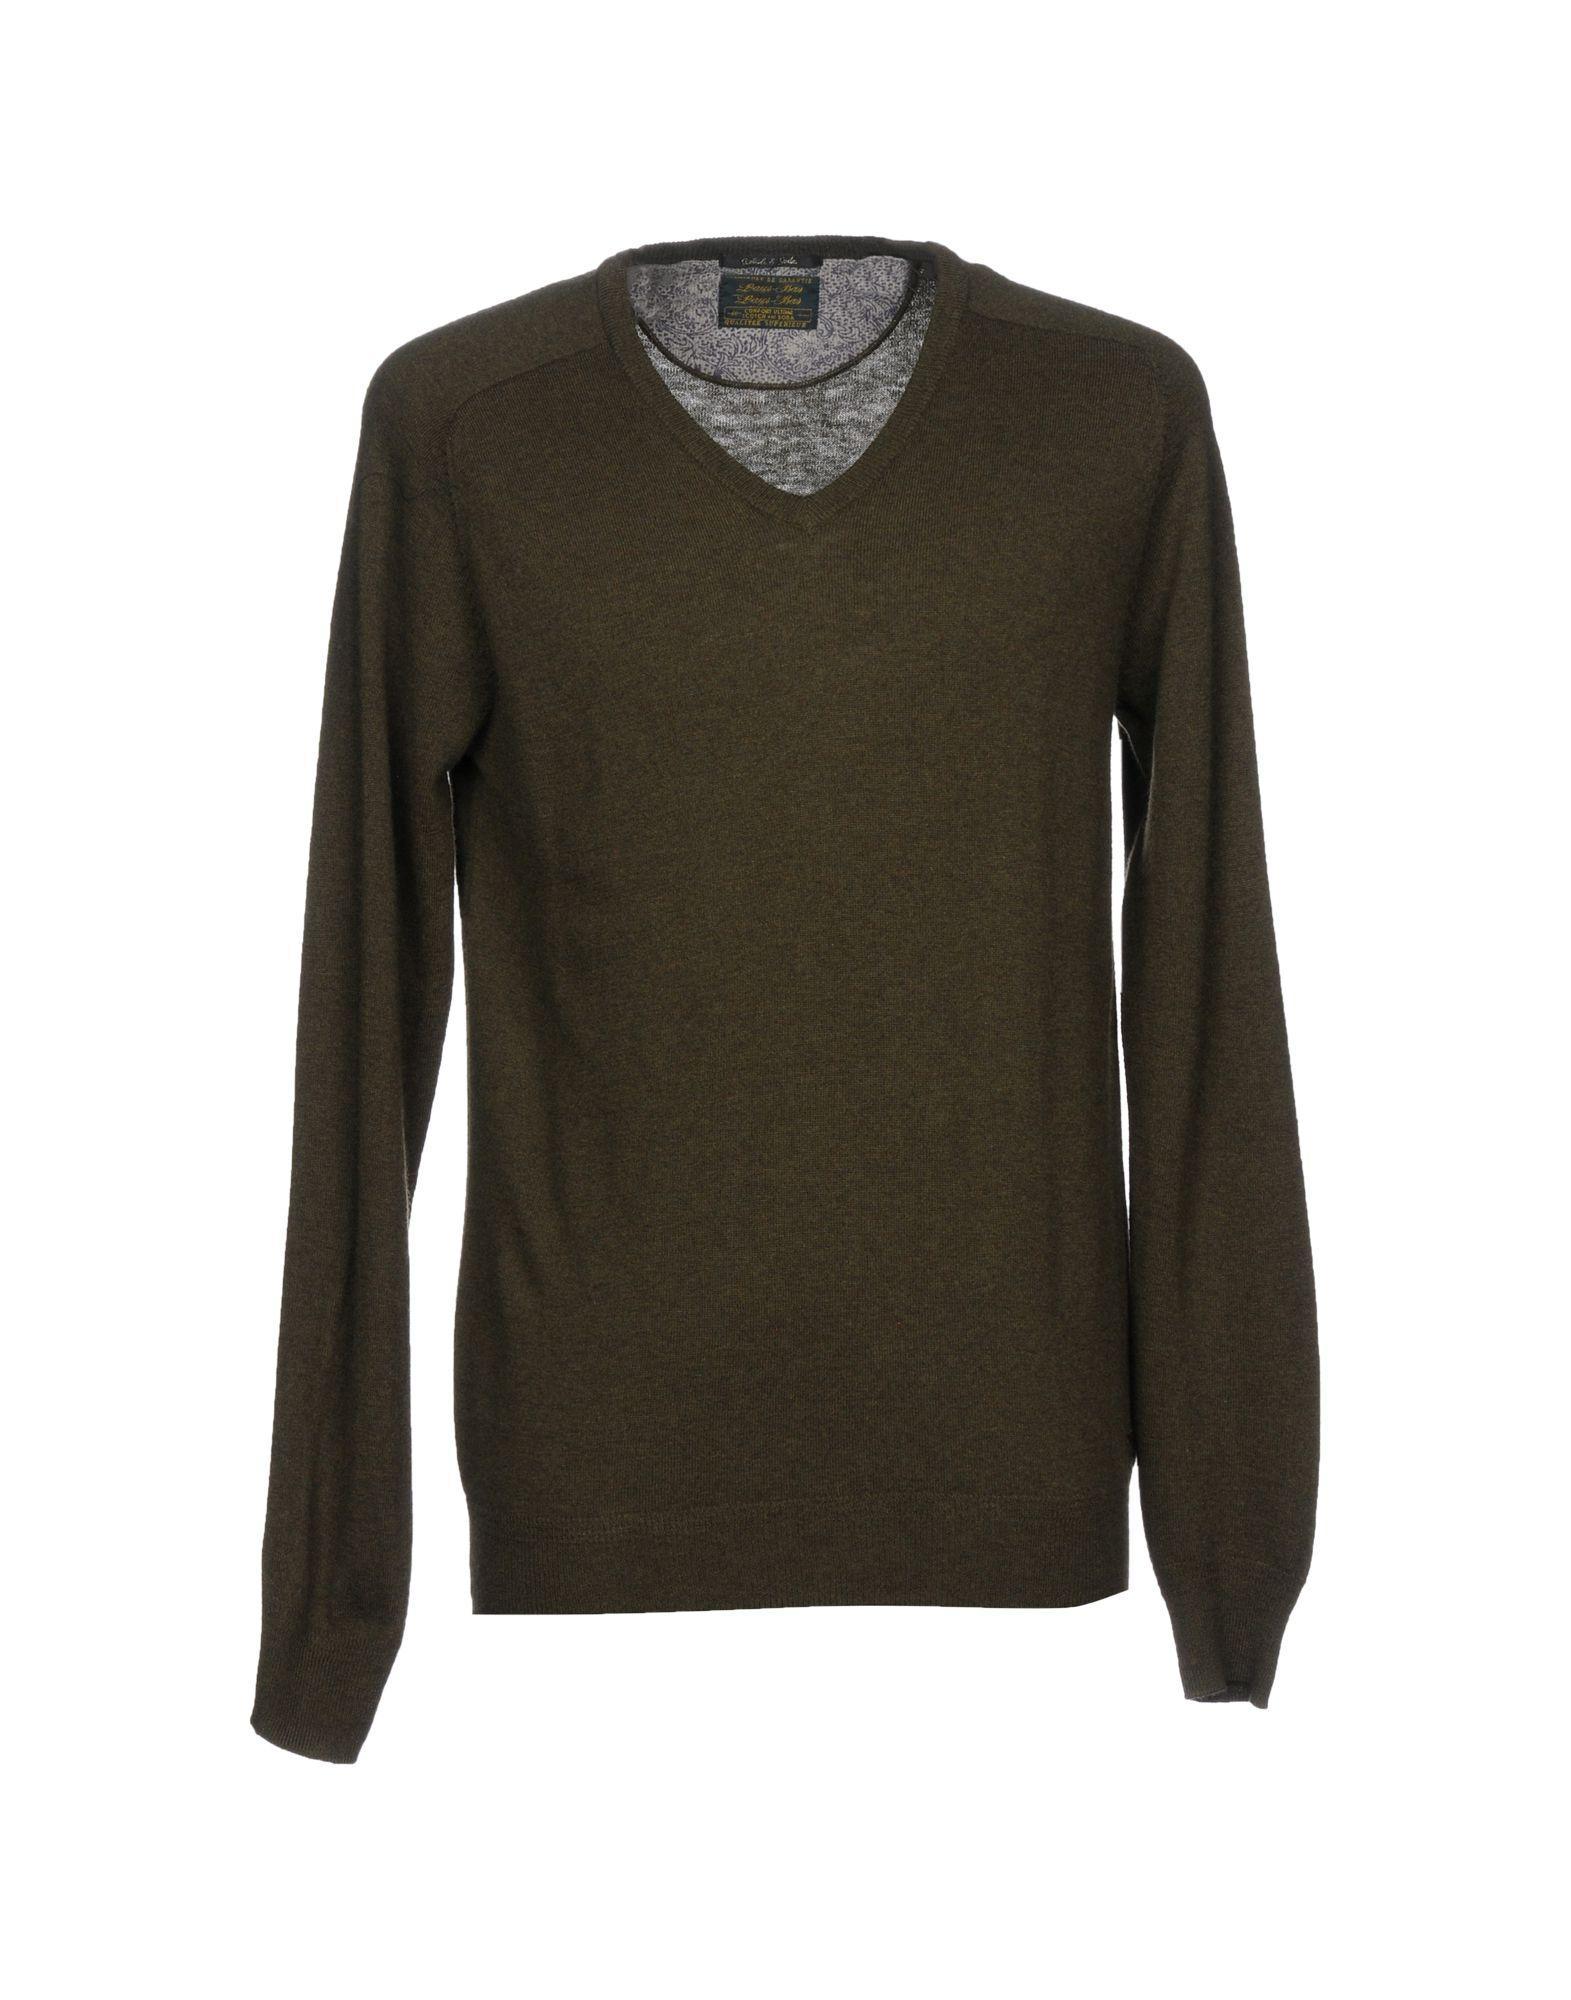 Scotch & Soda Sweater In Military Green